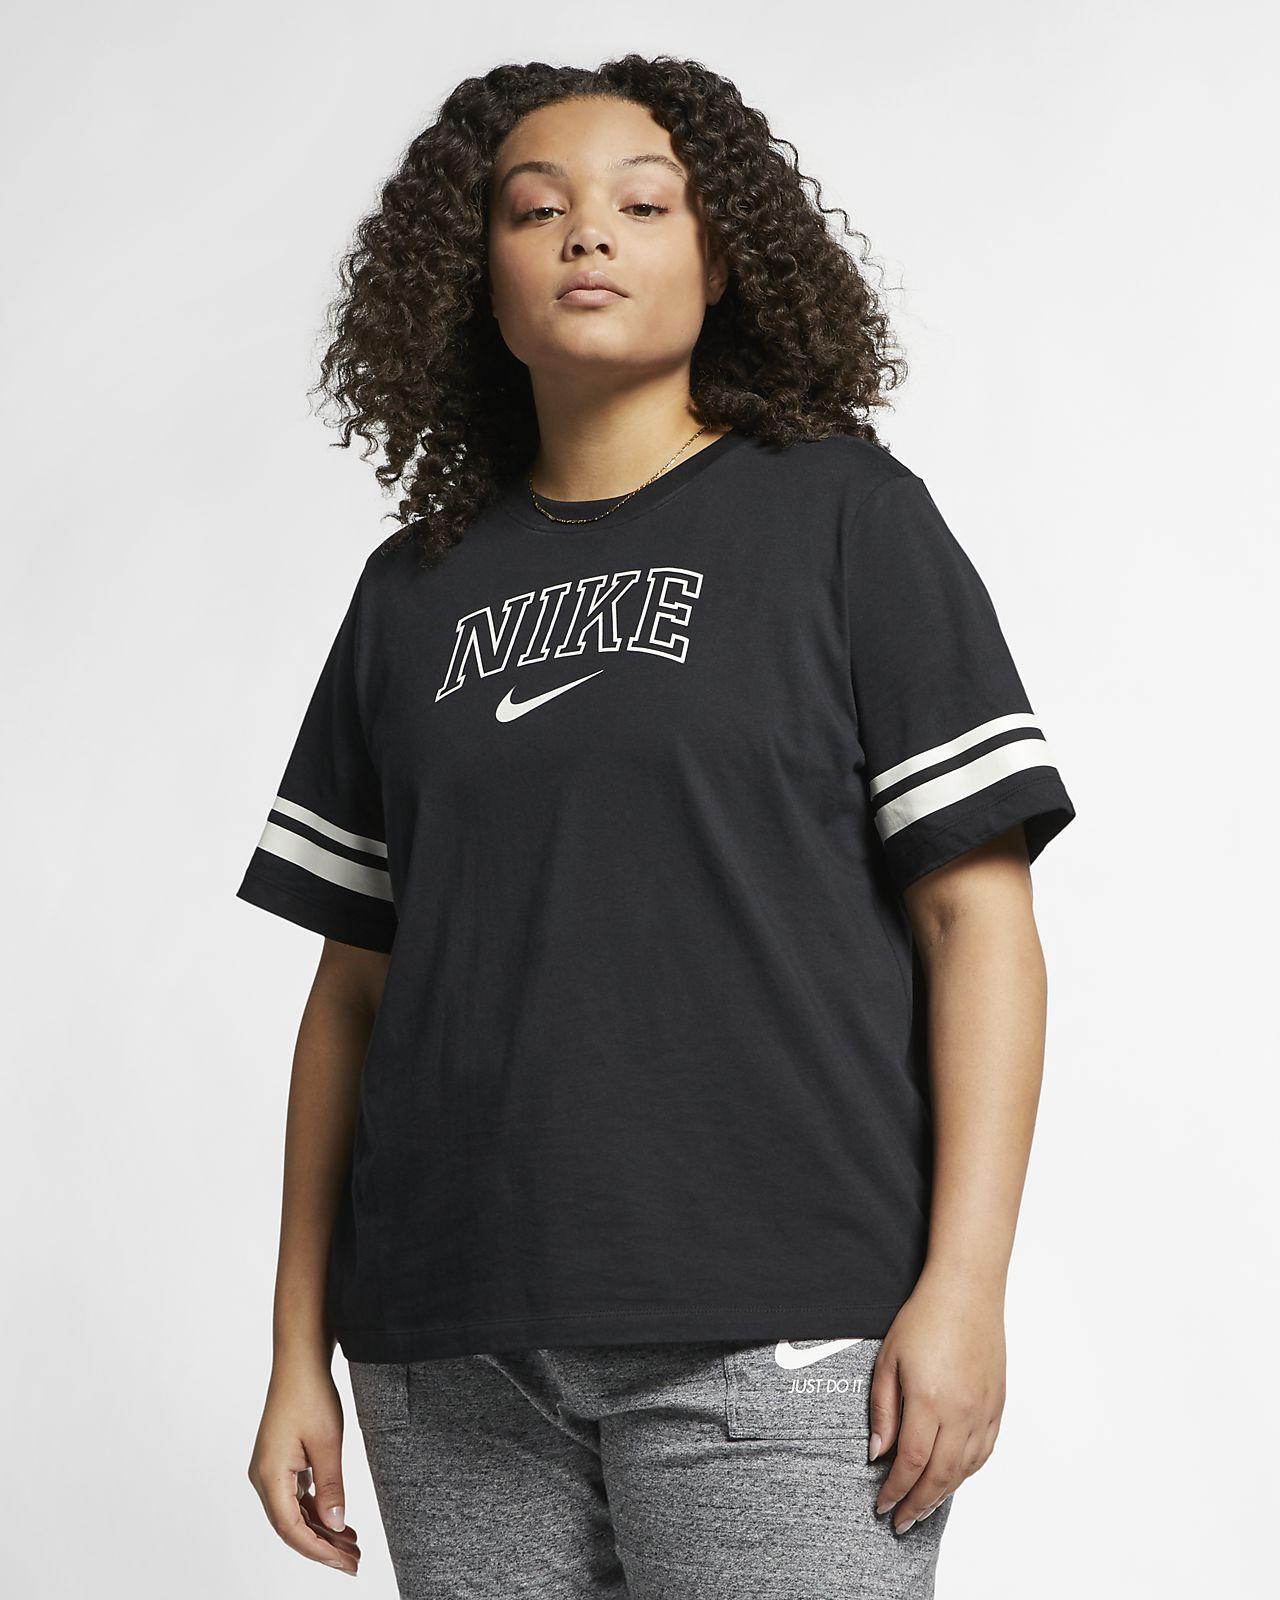 92a5b23a18b Nike Sportswear Women's Short-Sleeve Top (Plus Size). Nike.com